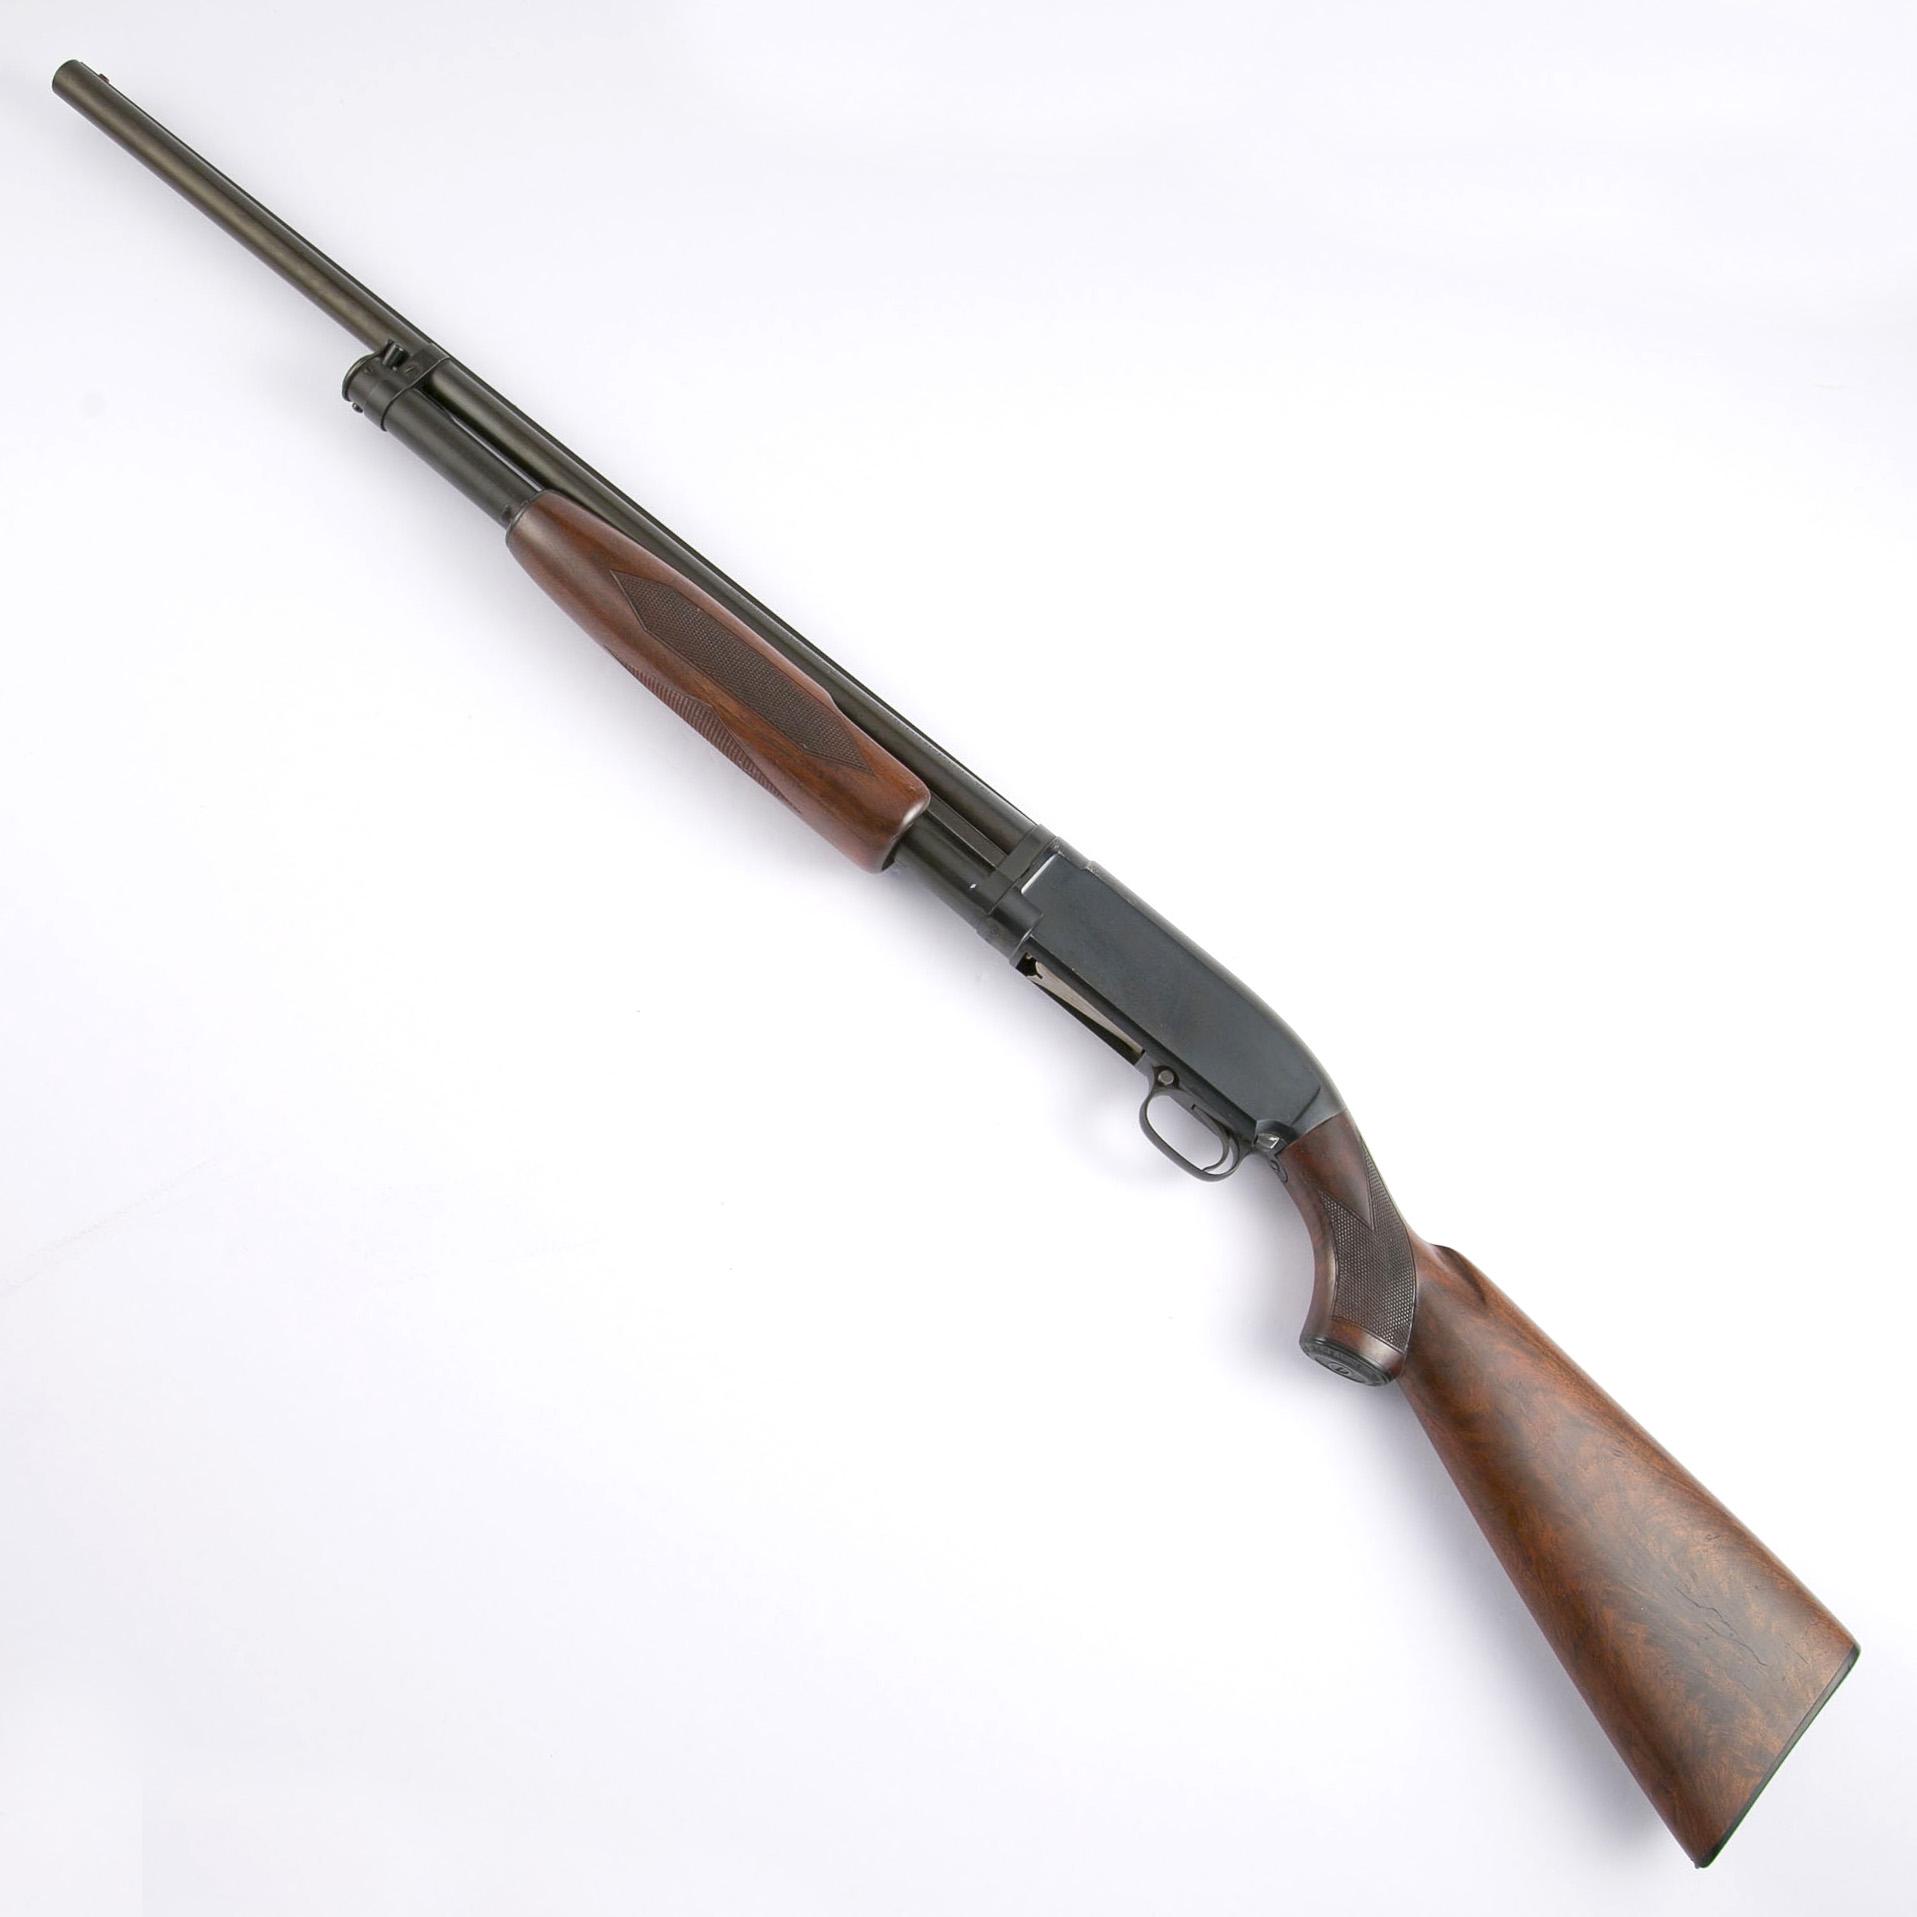 12 winchester shotgun model Winchester model